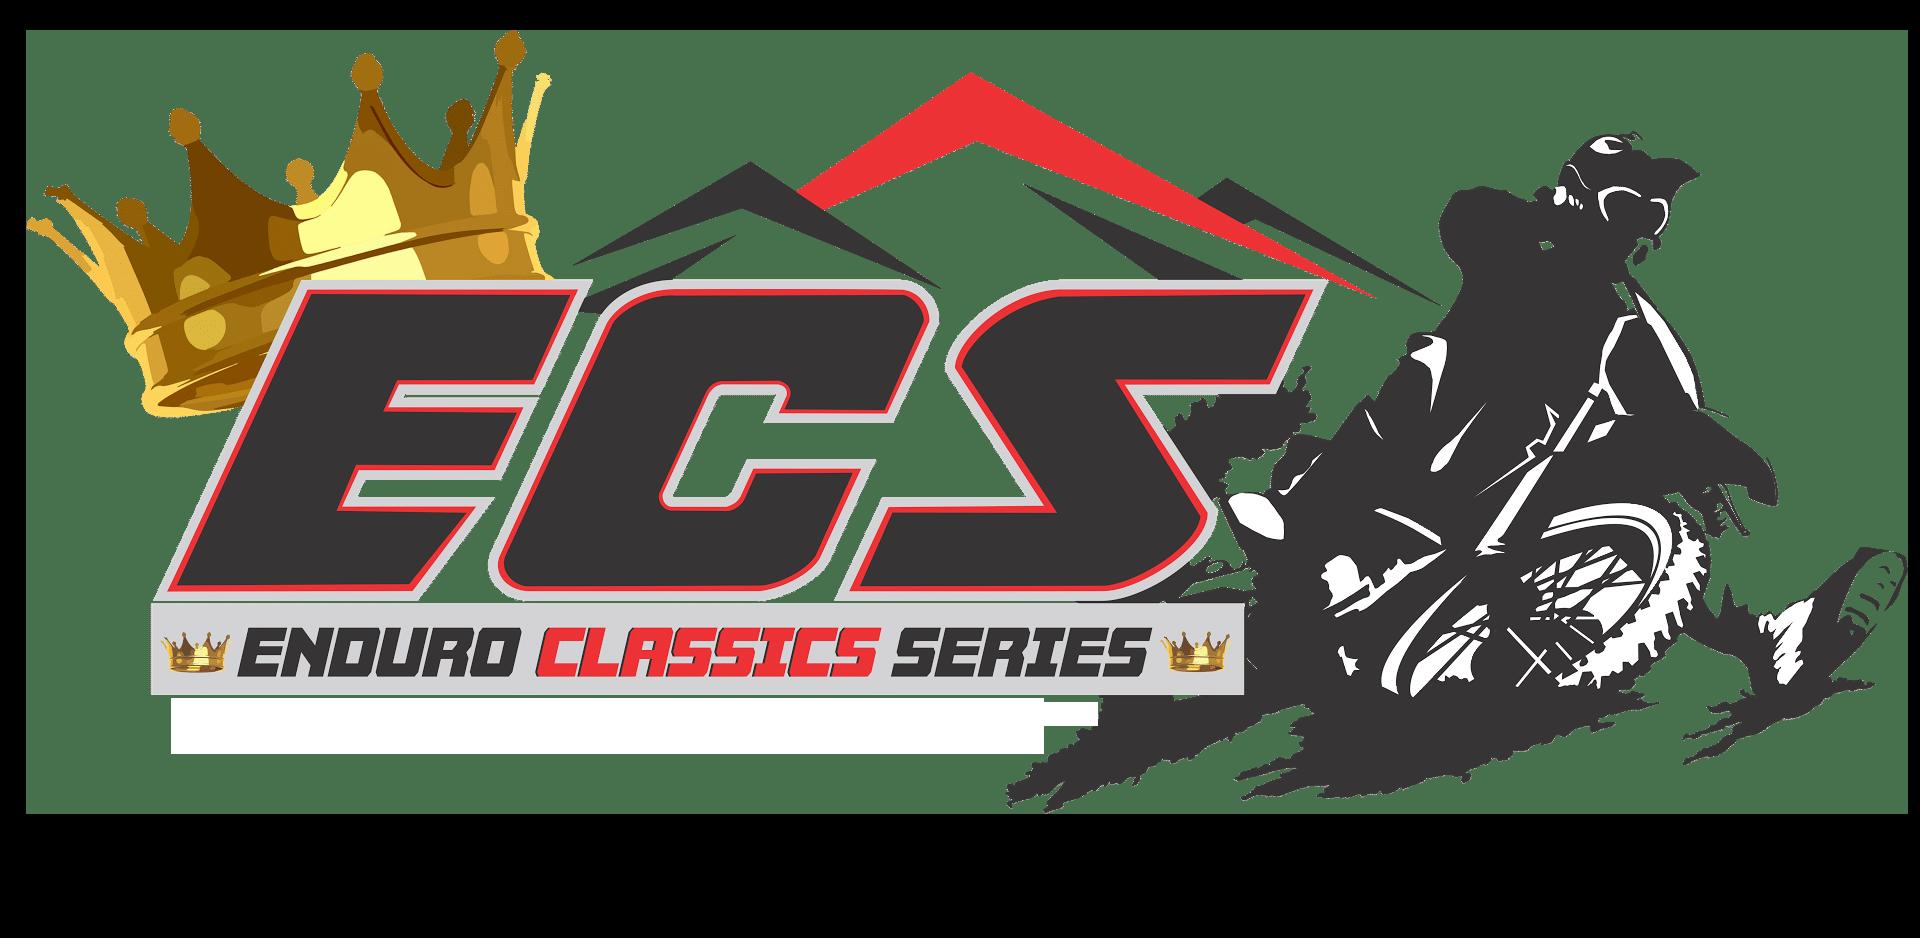 Enduro Classics Series